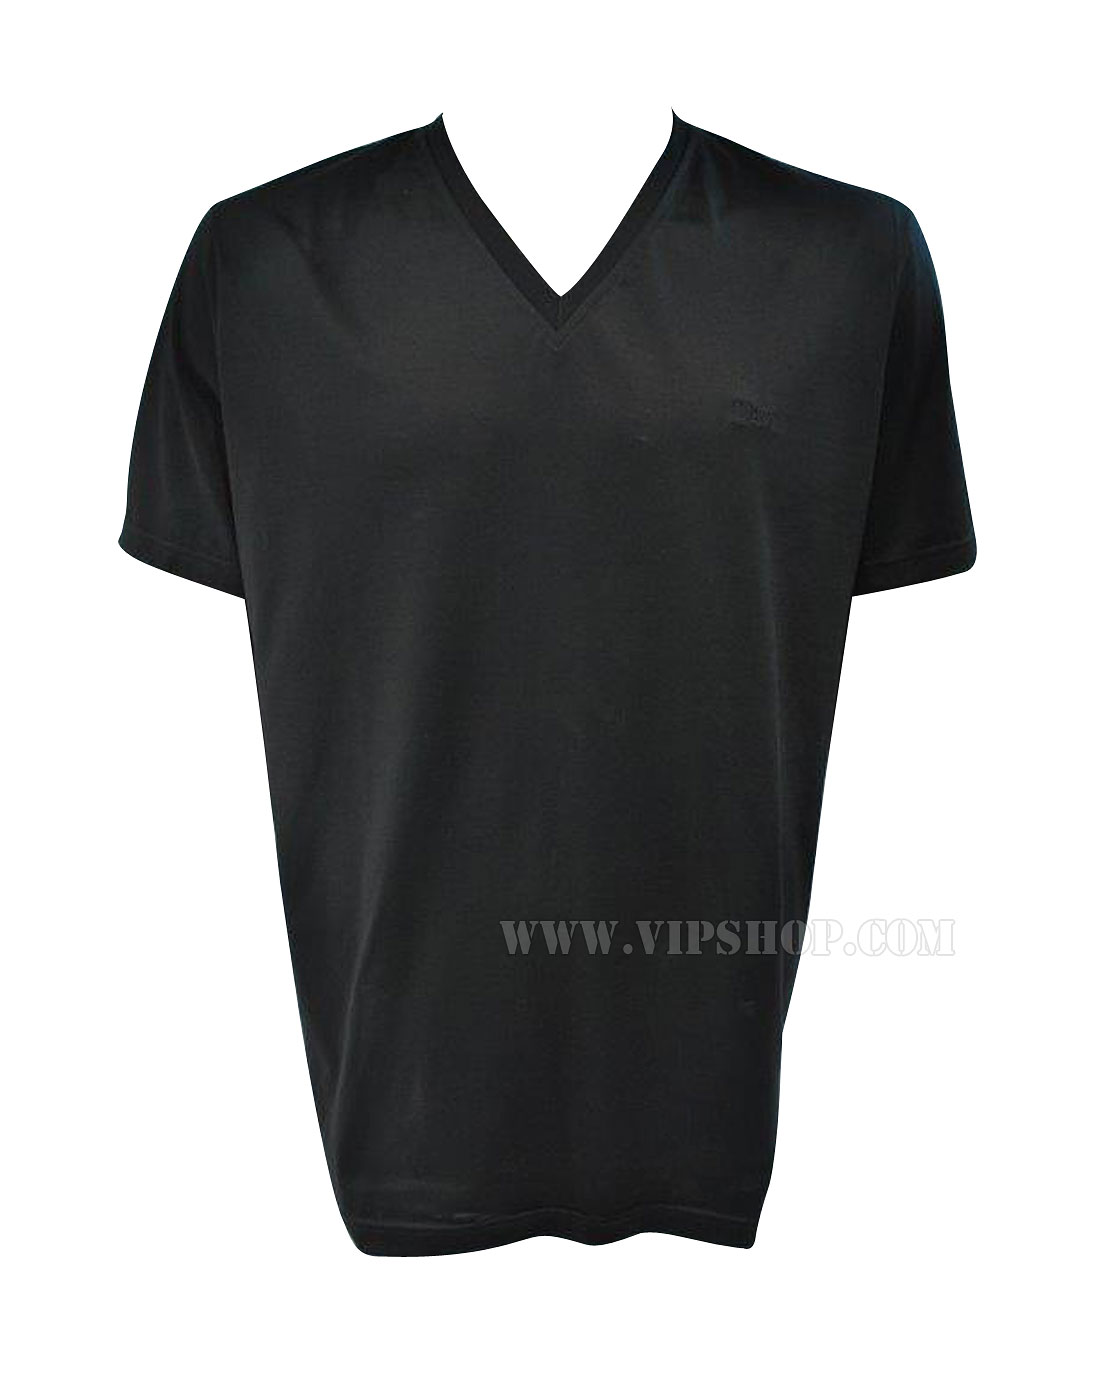 dior 男士黑色短袖t恤